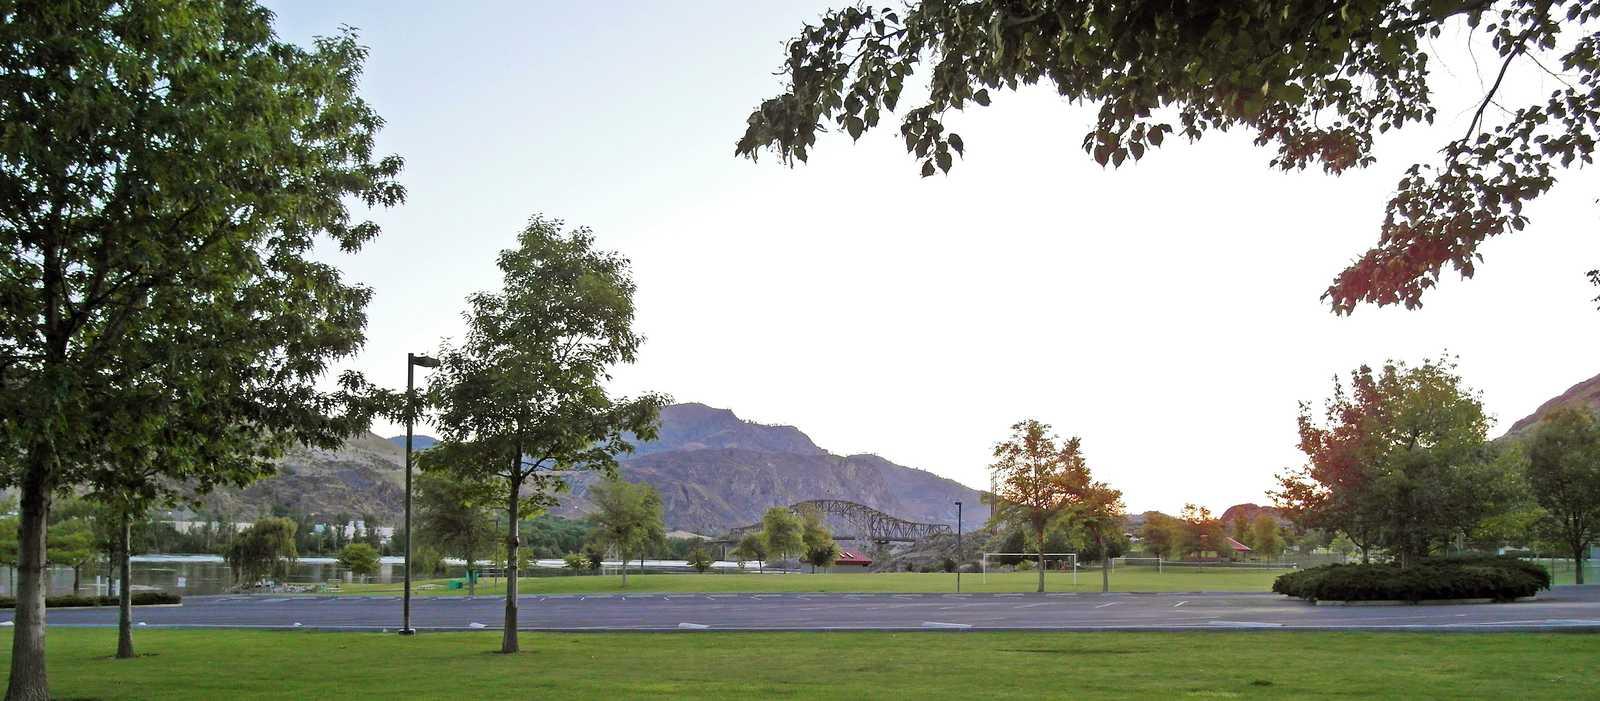 Stellplätze am Beebe Bridge Park